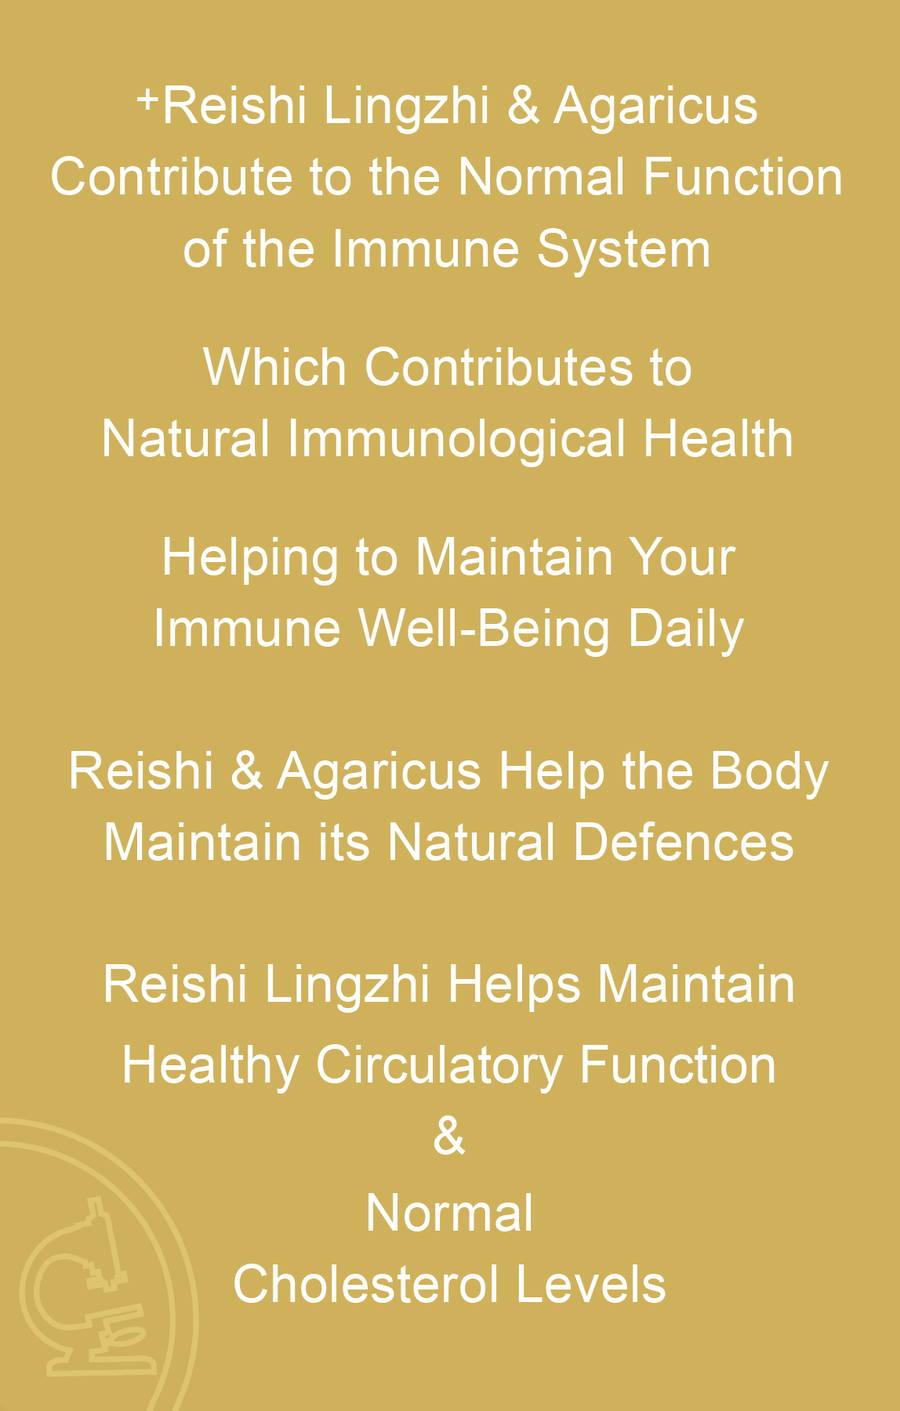 Immune Pro 3 Benefits